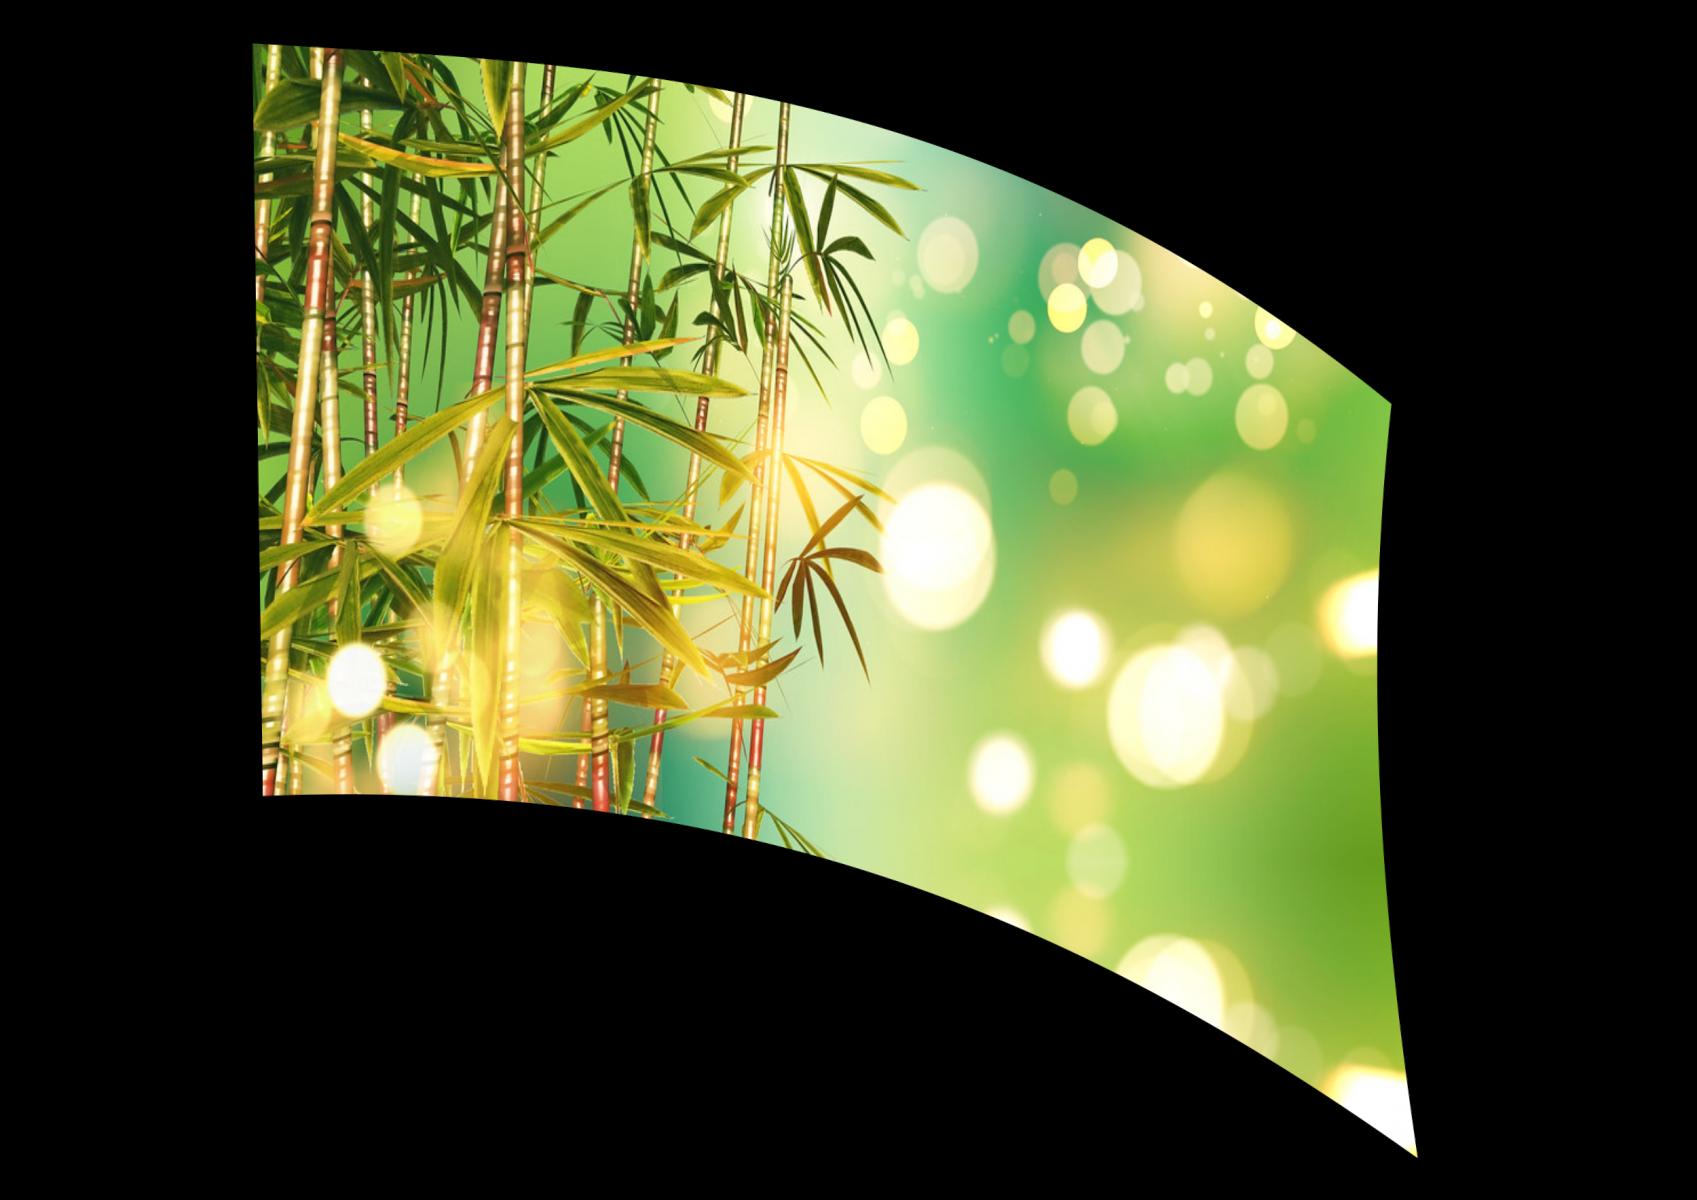 070306s - 36x54 Standard Bamboo